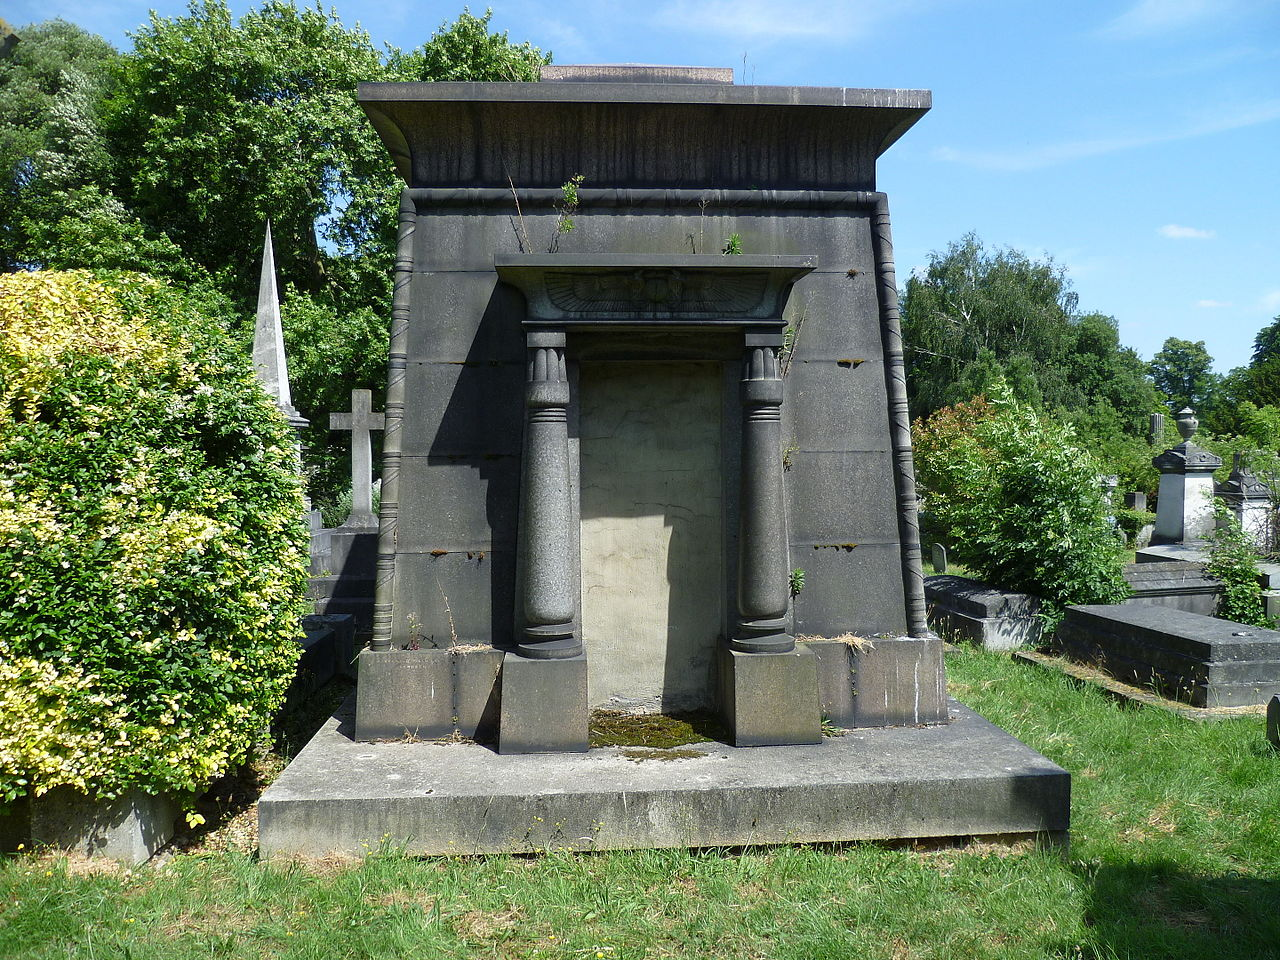 Egyptian_style_mausoleum_-_Kensal_Green_Cemetery.JPG